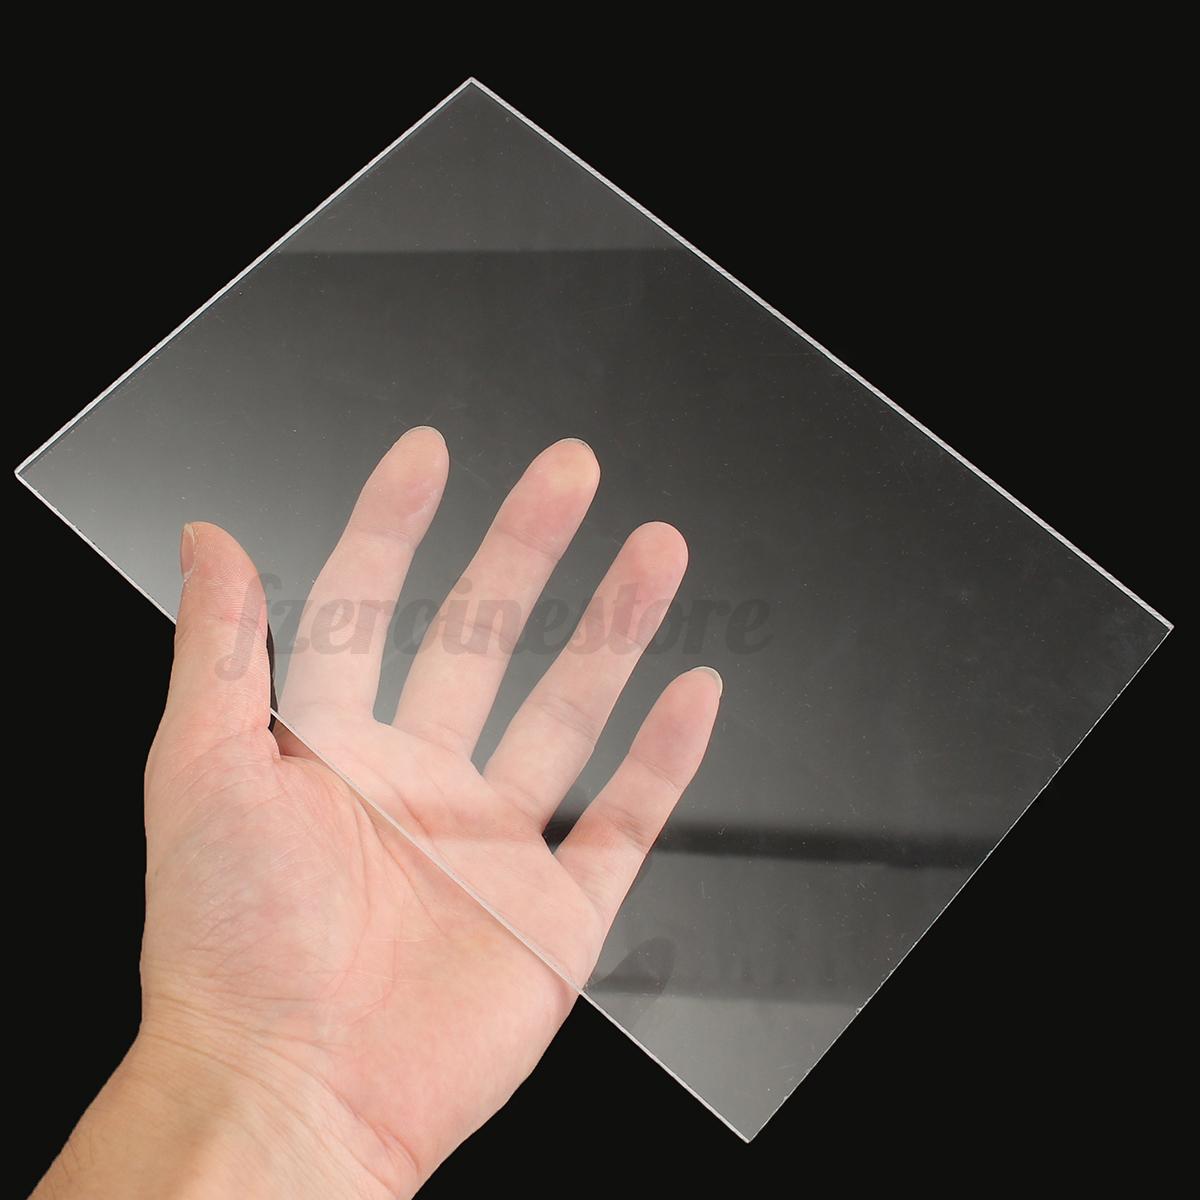 3 10mm acrylglas plexiglass acrylscheiben zuschnitt acryl. Black Bedroom Furniture Sets. Home Design Ideas